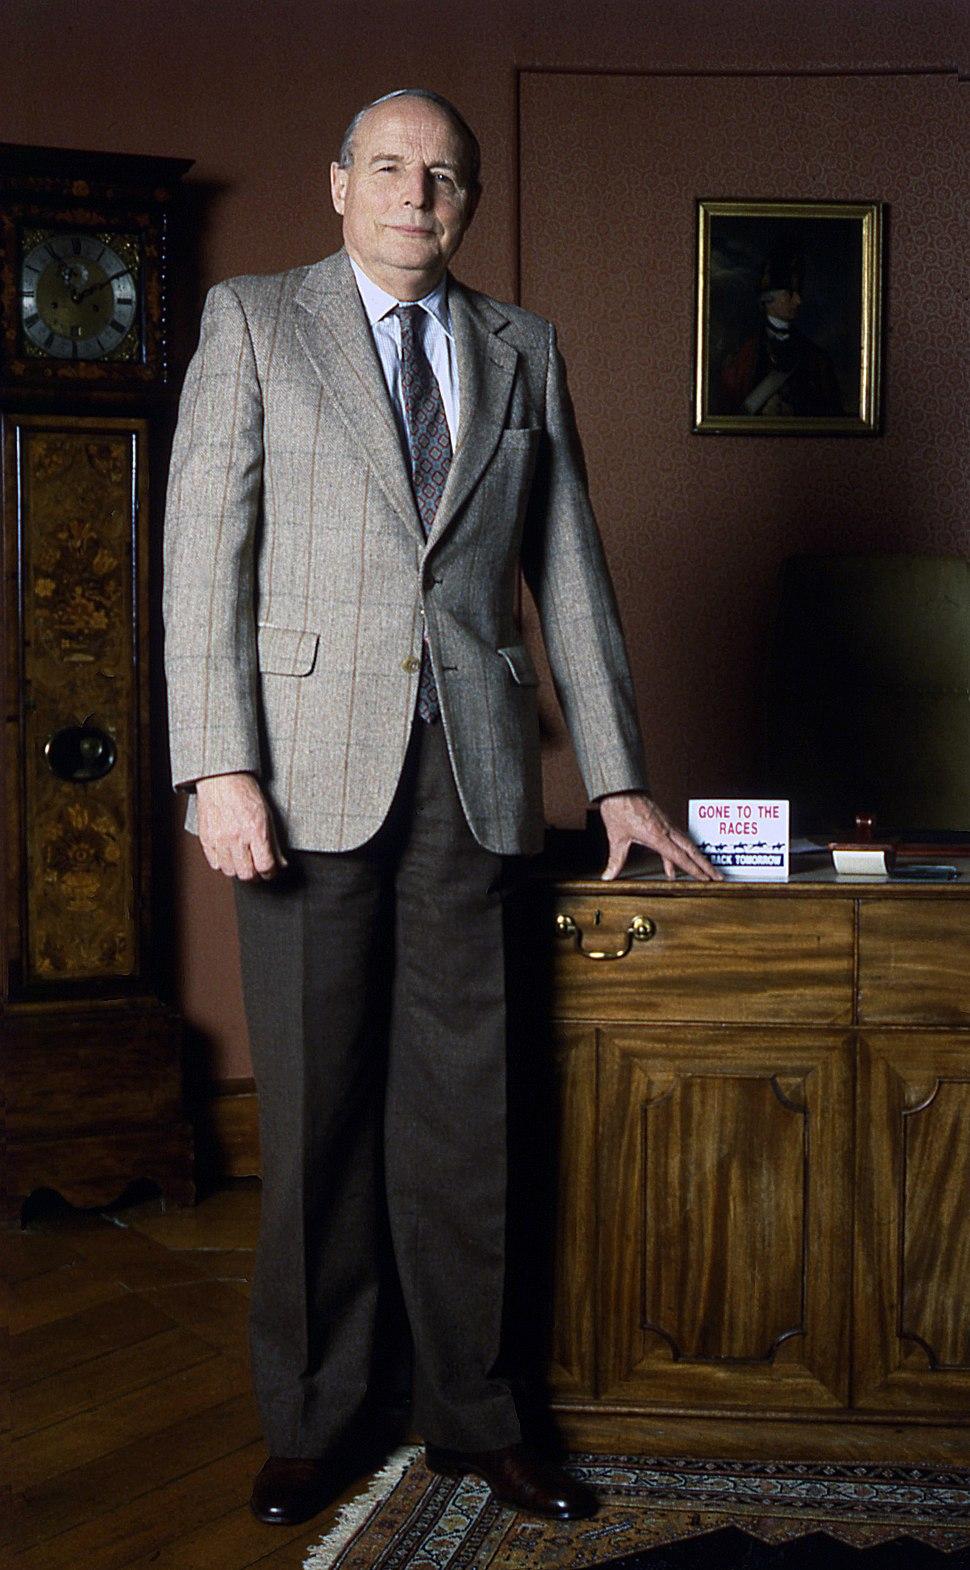 10th Duke of Richmond %26 Gordon 4 Allan Warren